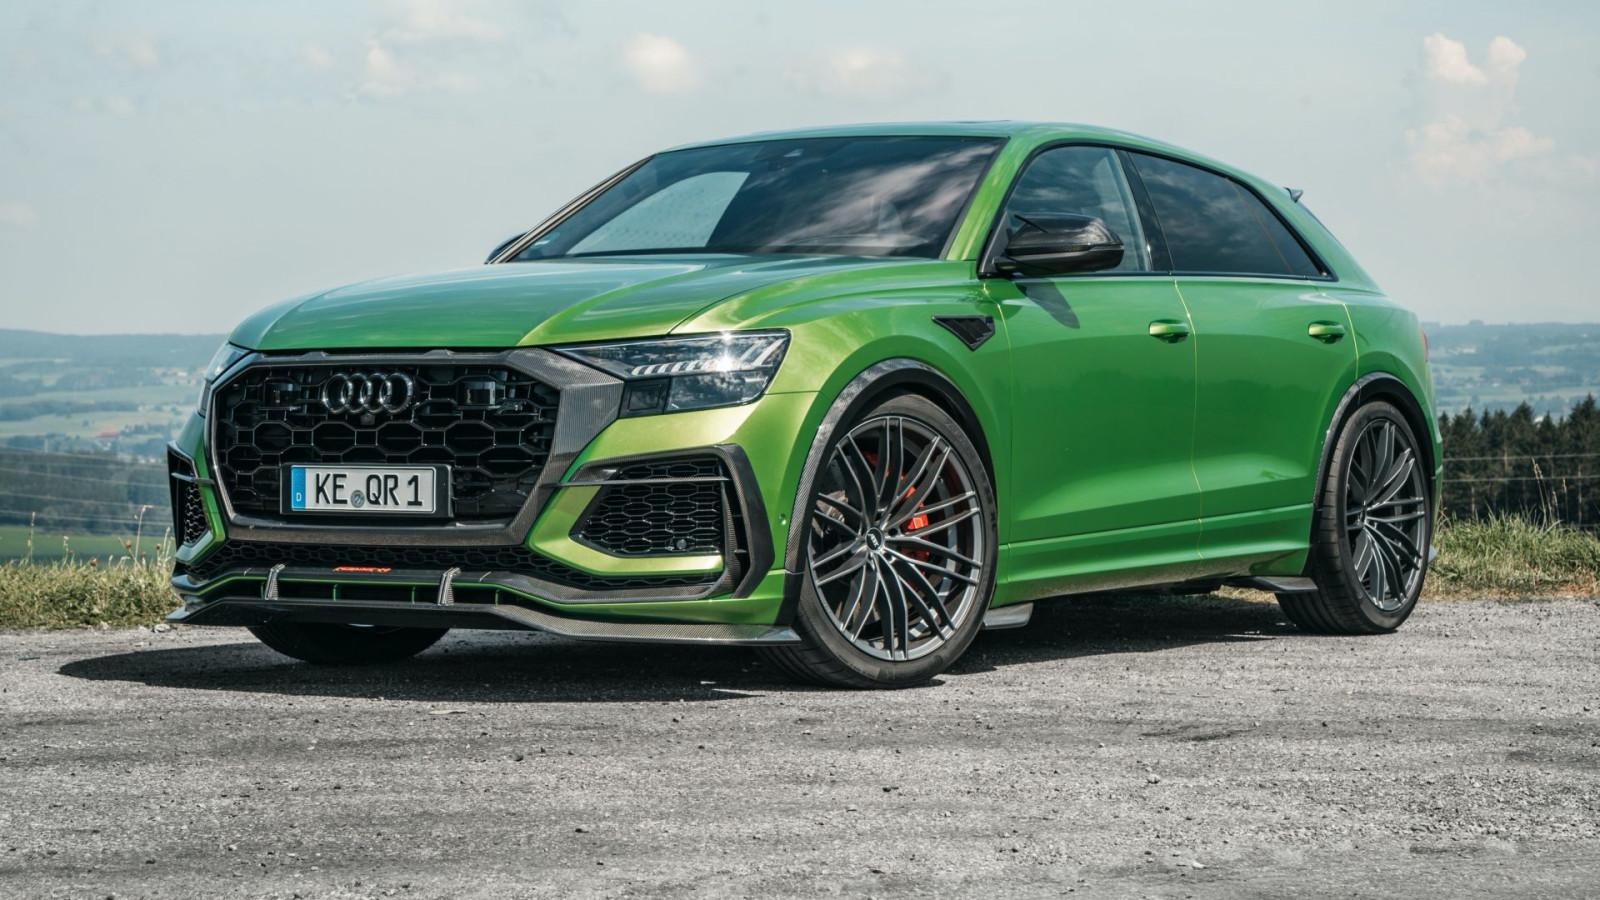 Audi RSQ8-R, Abt, Abt Sportsline, SUV, Power-SUV